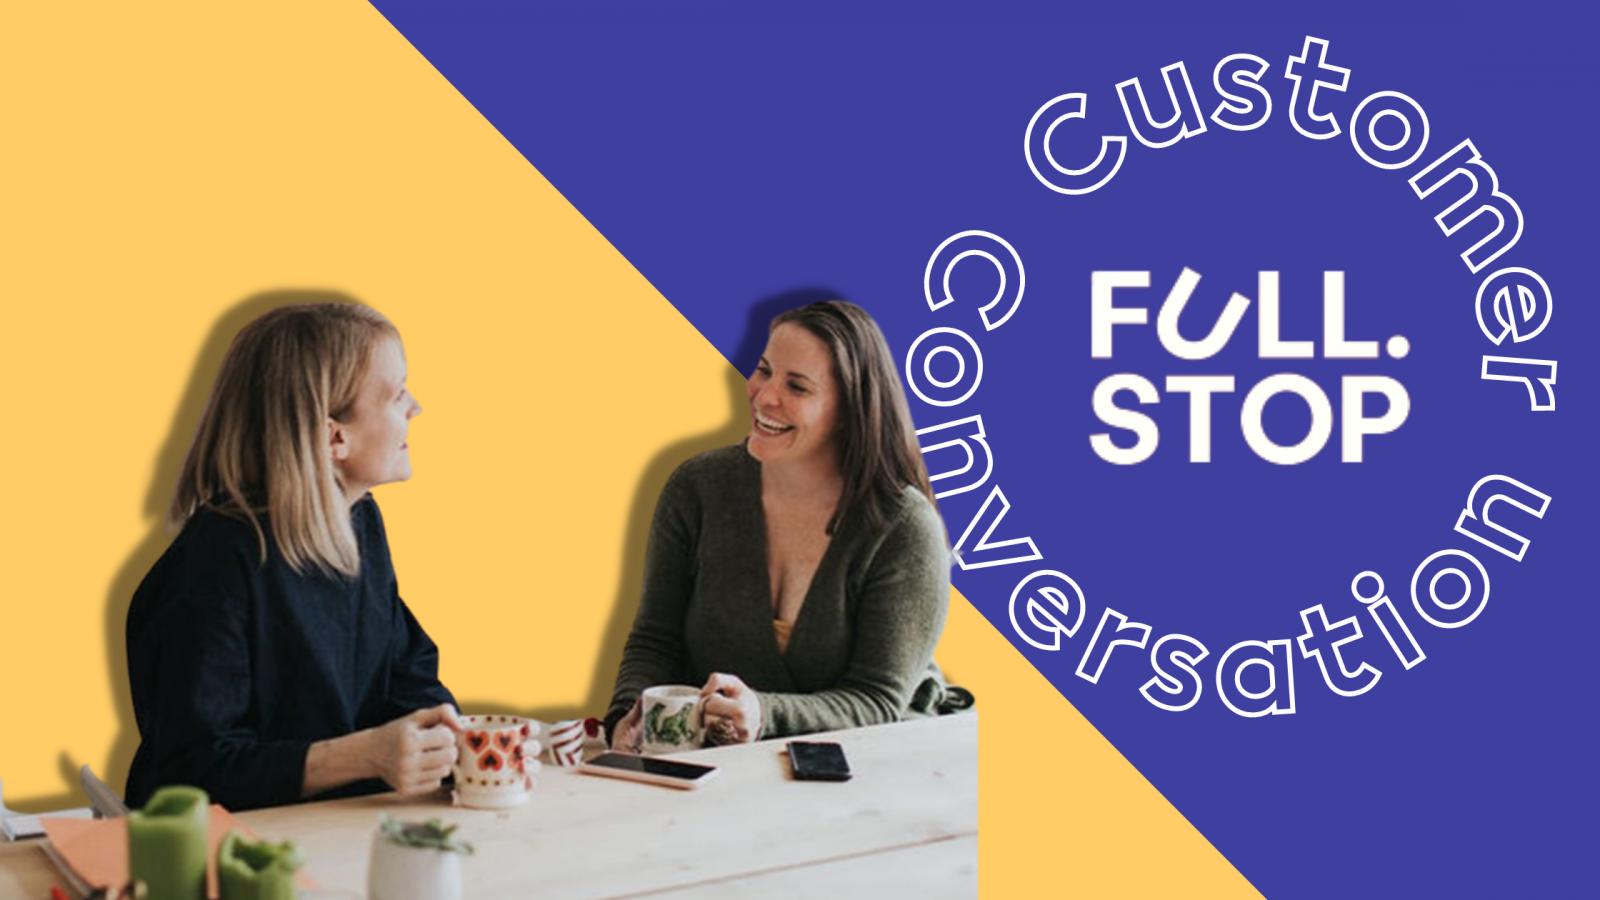 Customer Conversation Full-Stop Accounts